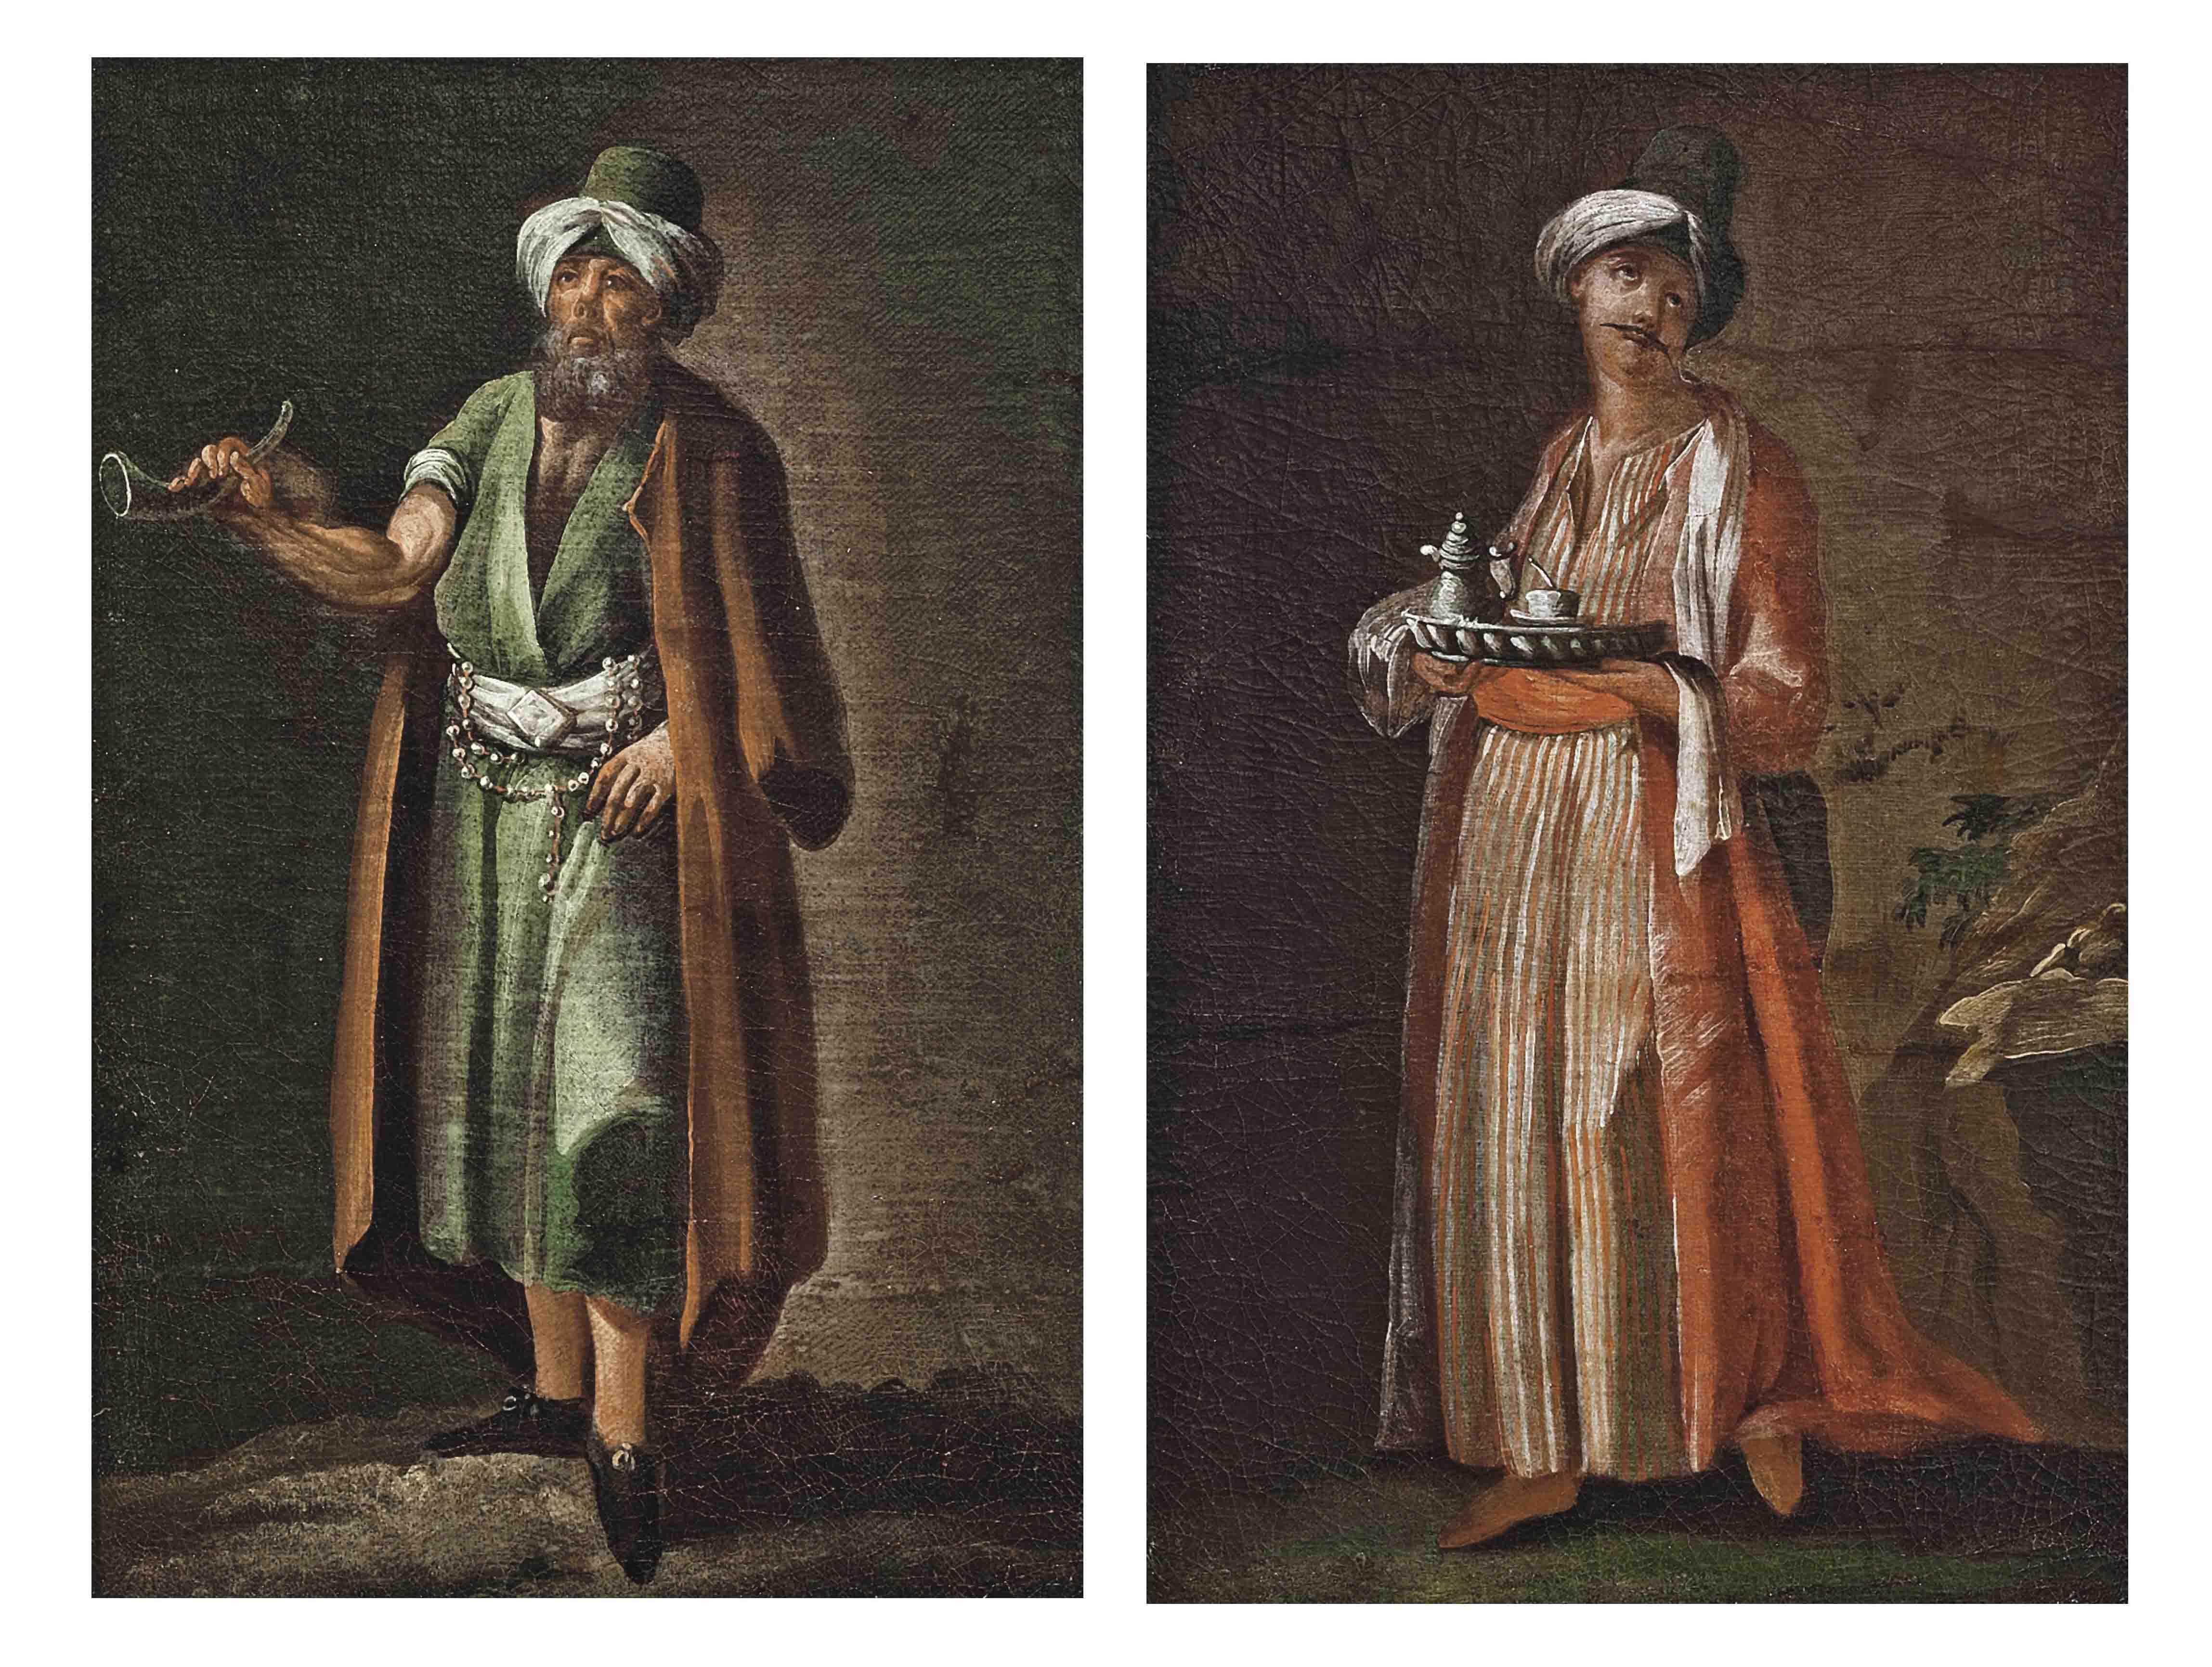 Figures in Levantine dress